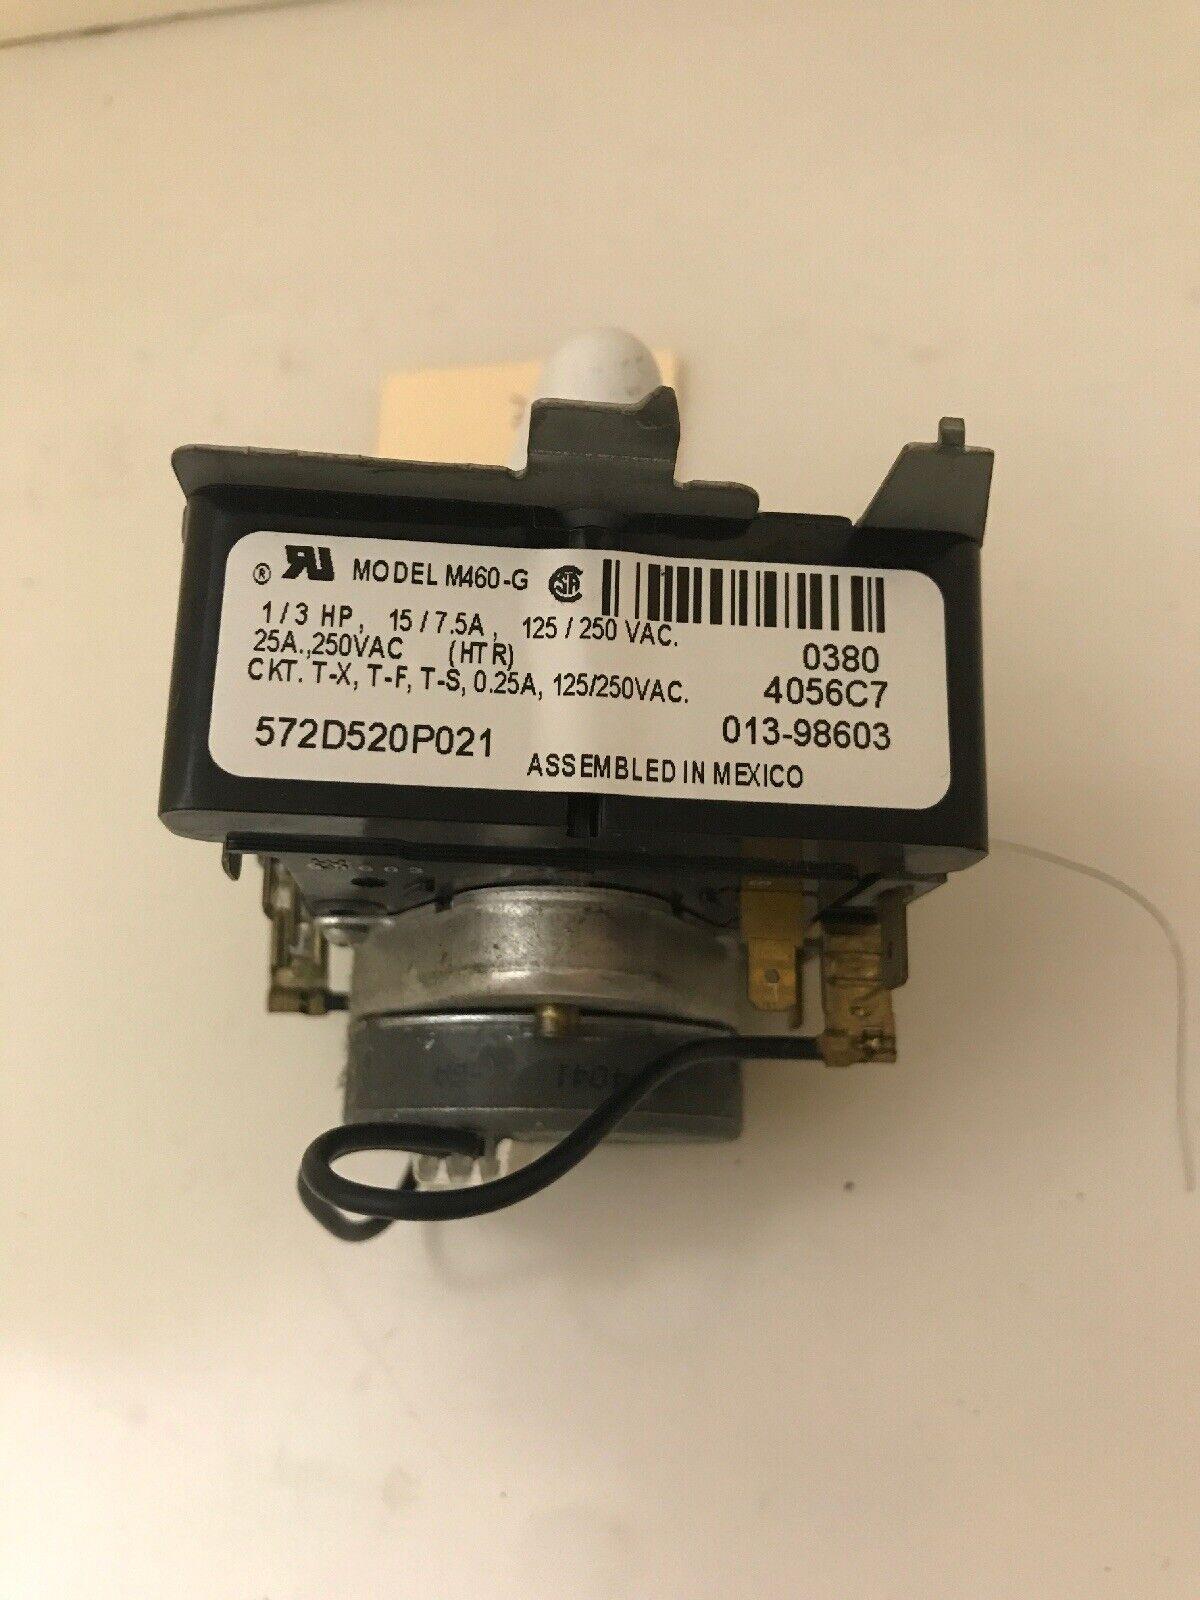 DIAGRAM] Maytag M460 G Dryer Wiring Diagram FULL Version HD ... on